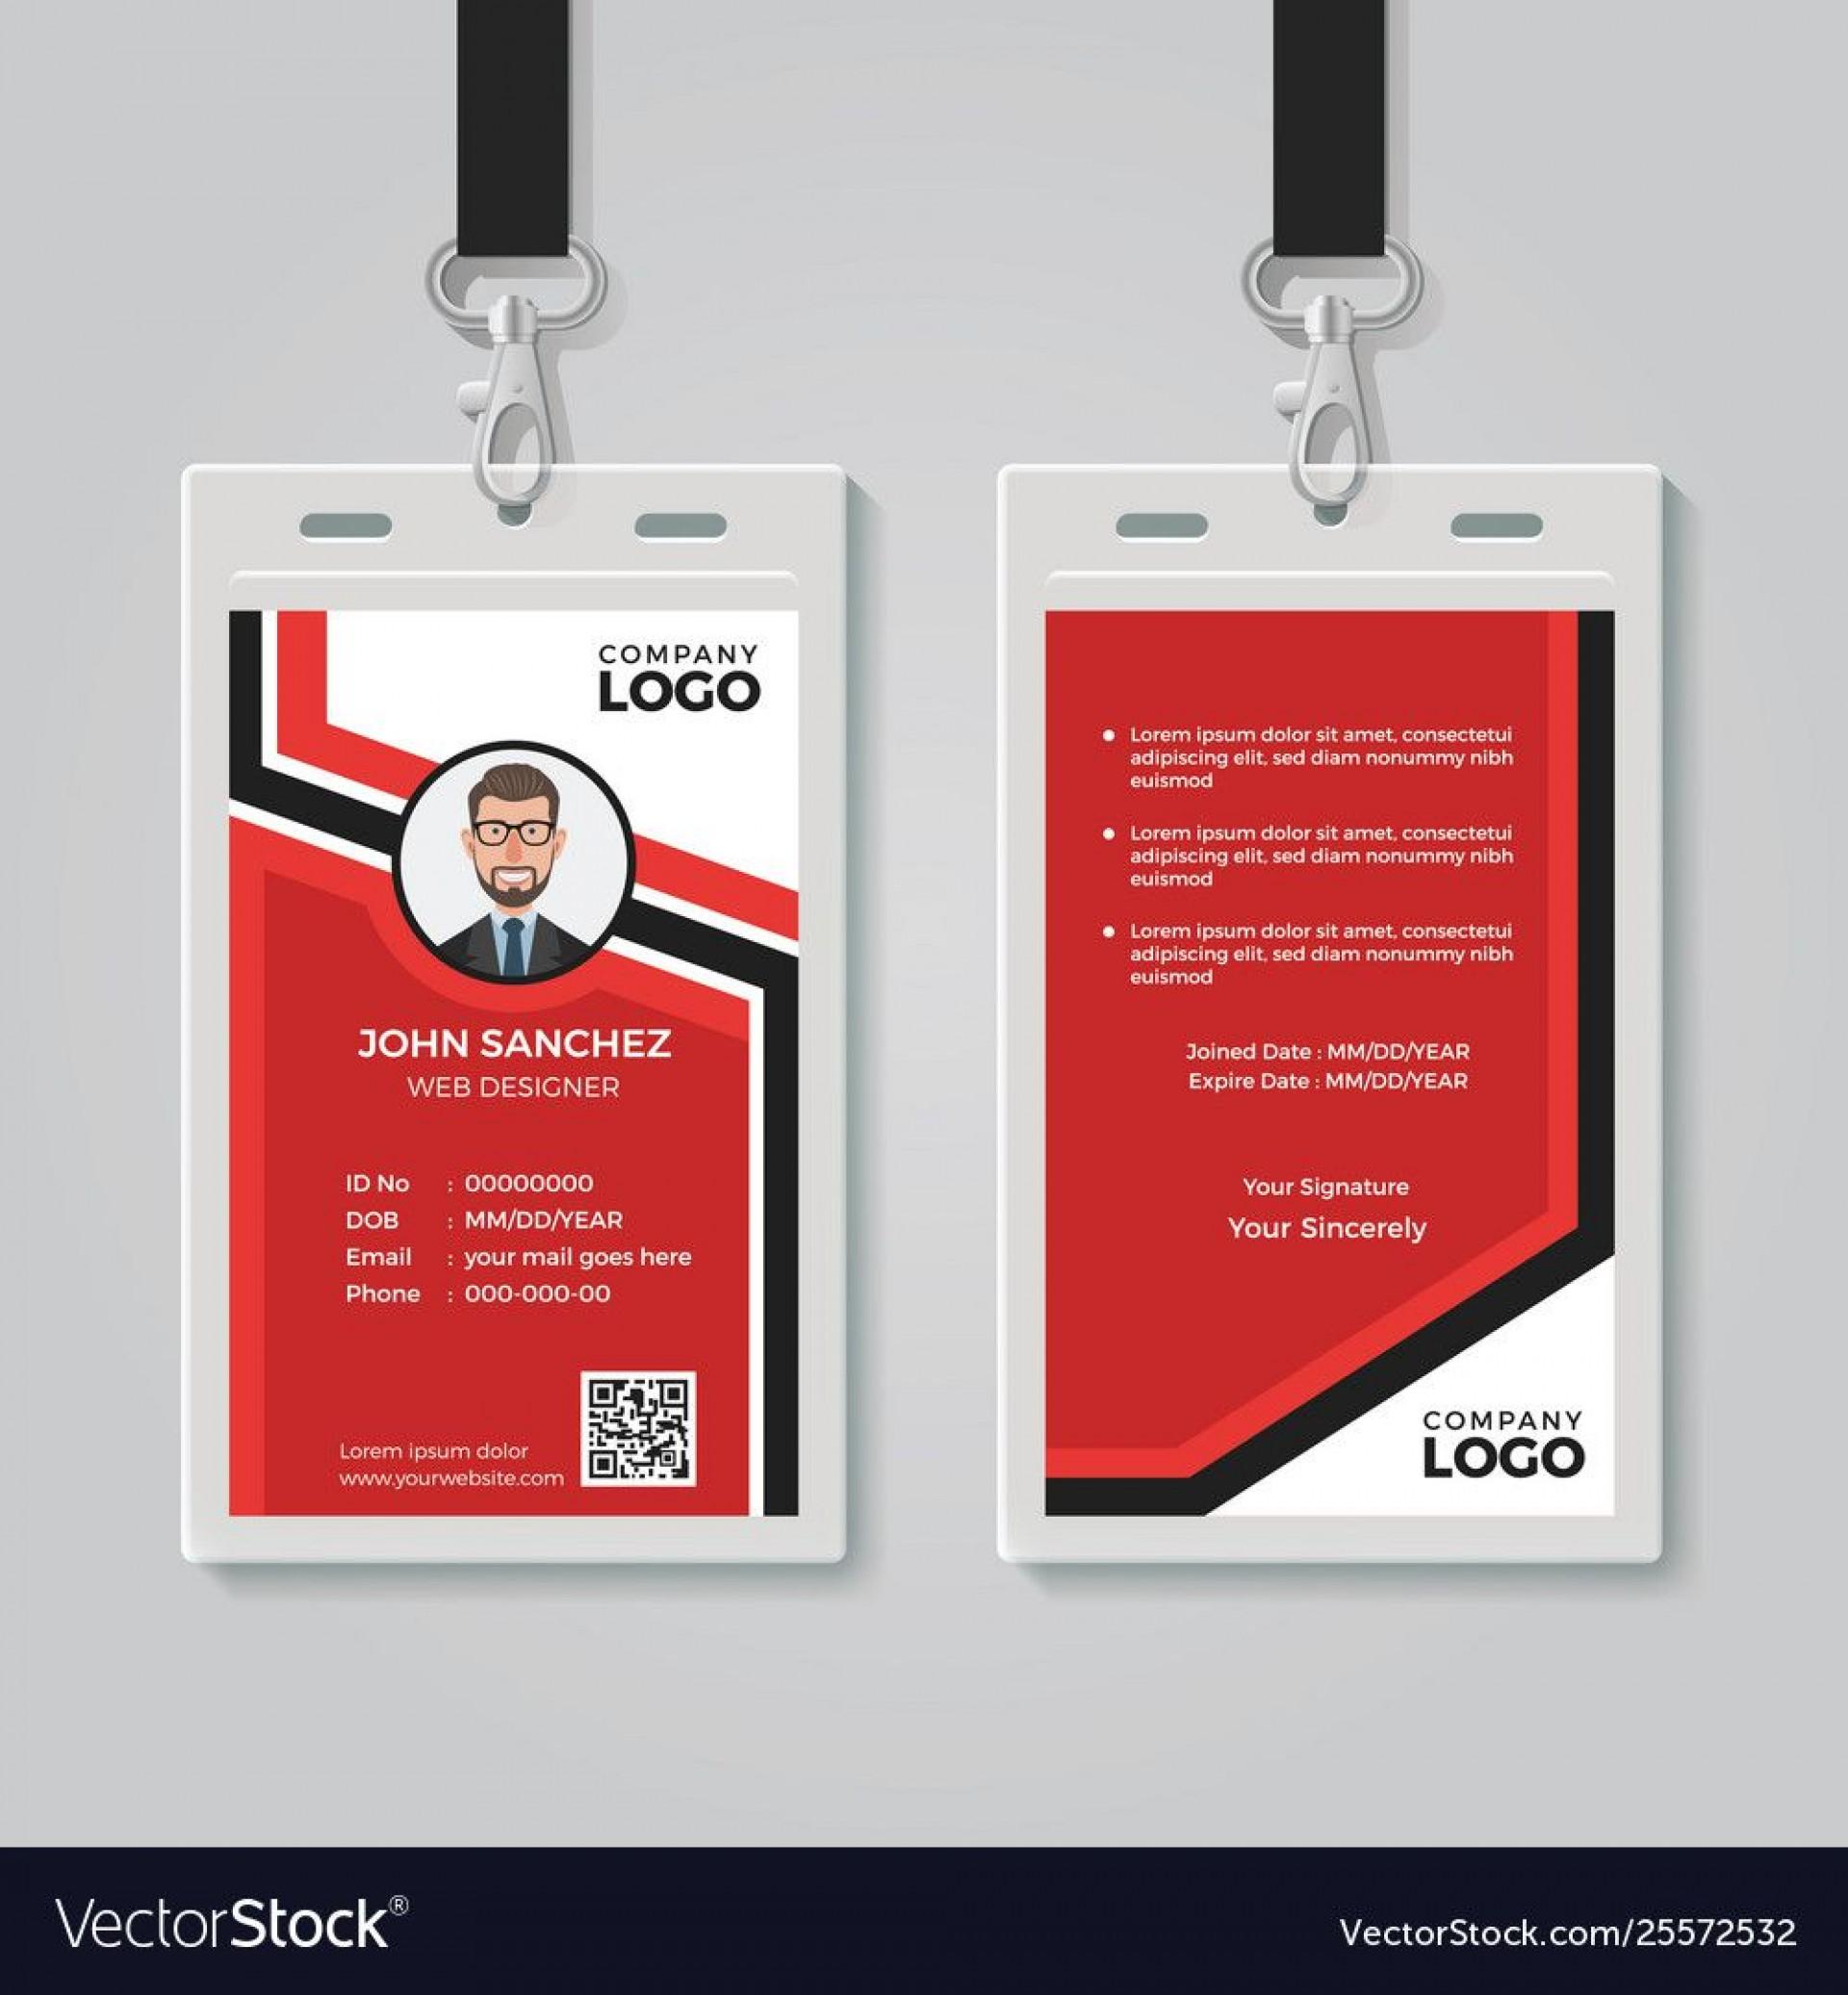 009 Unusual Id Card Template Free Image  Download Pdf Design1920